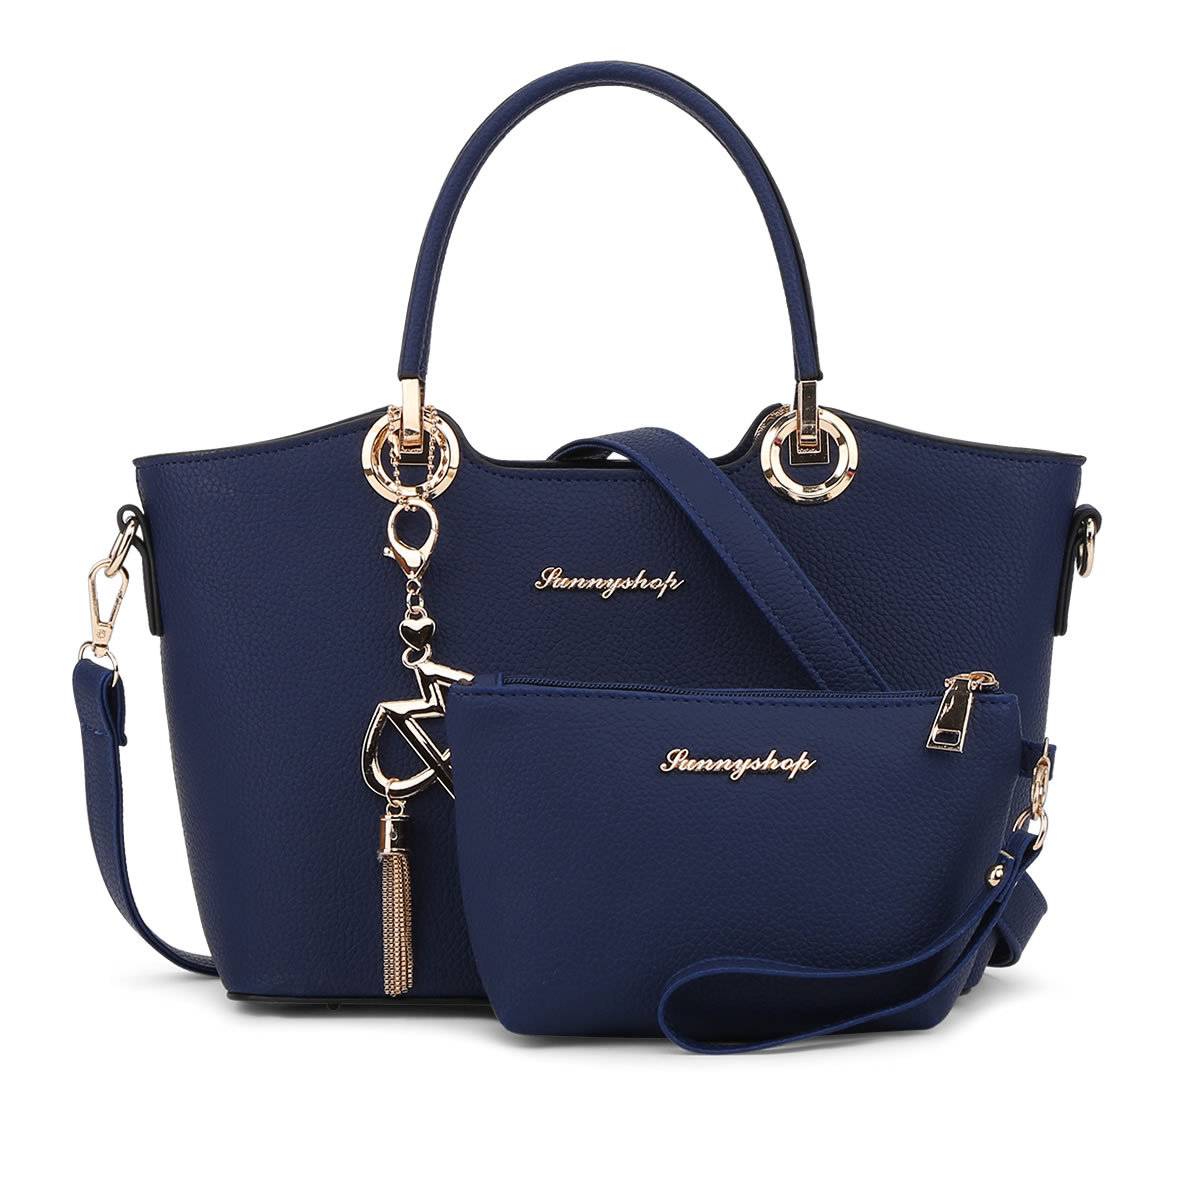 2 Bags/set 2017 Fashion Women Leather Handbag Women Messenger Bags Crossbody Bags High Quality Famous Designer Brand Ladies Bags<br><br>Aliexpress